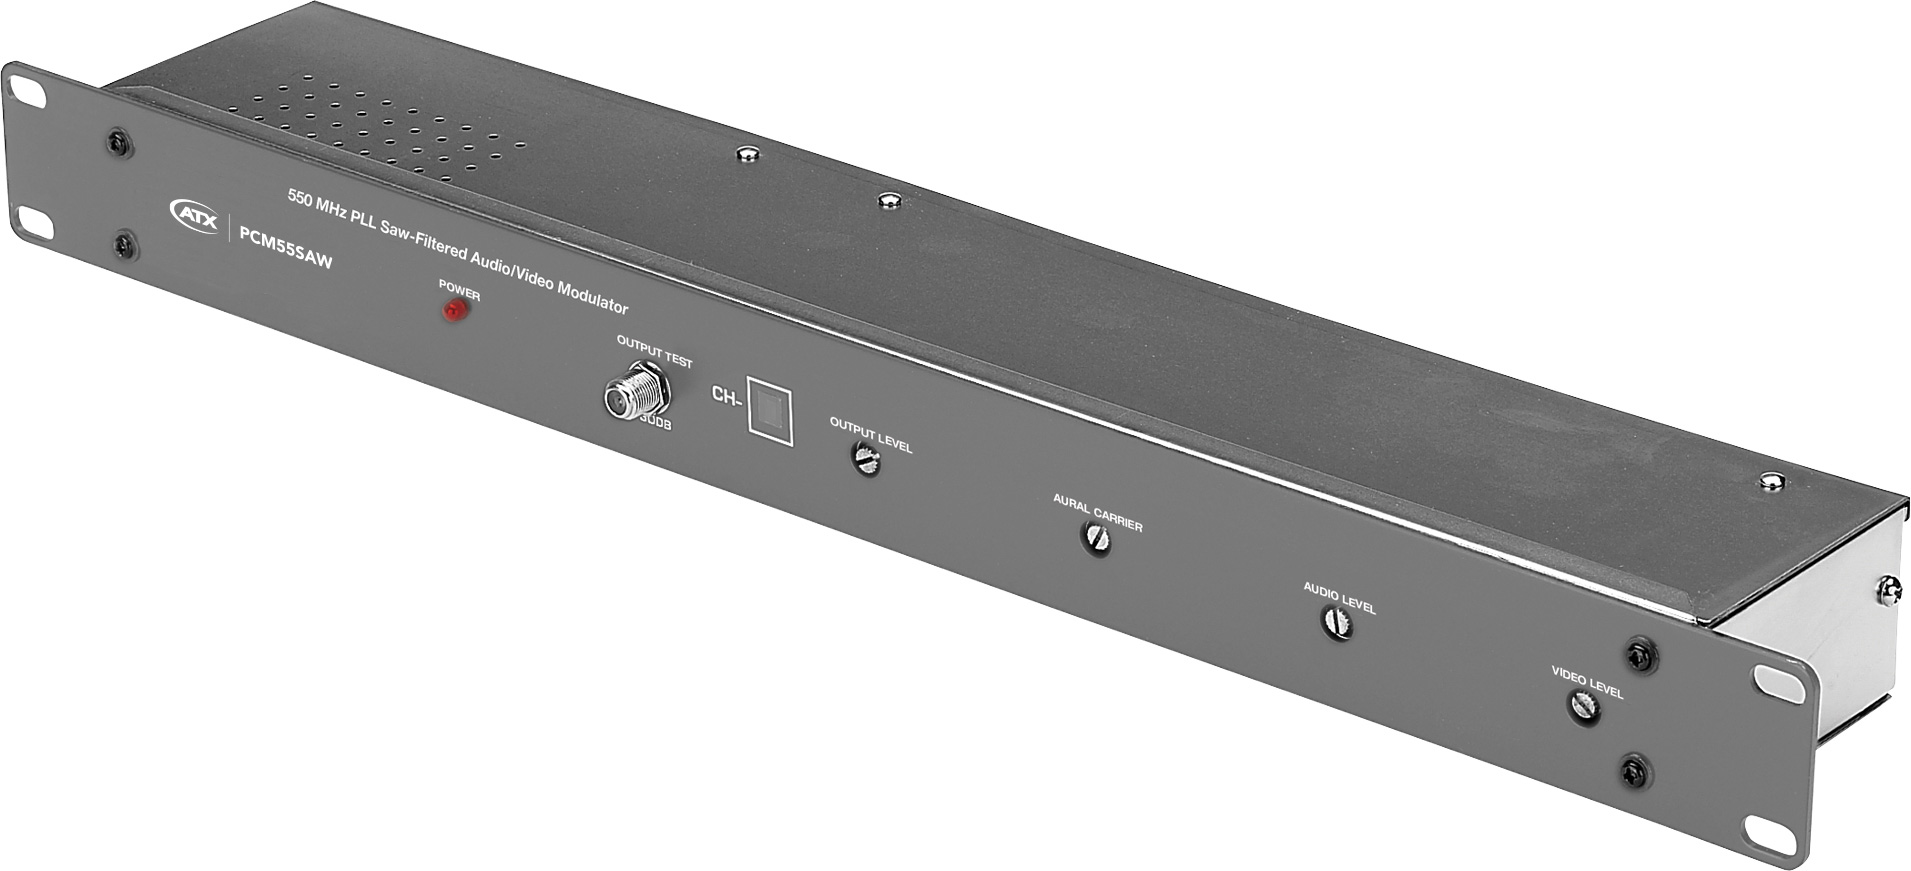 Pico Digital 1 Channel Crystal A/V Modulator - Channel S - 270-276 MHz